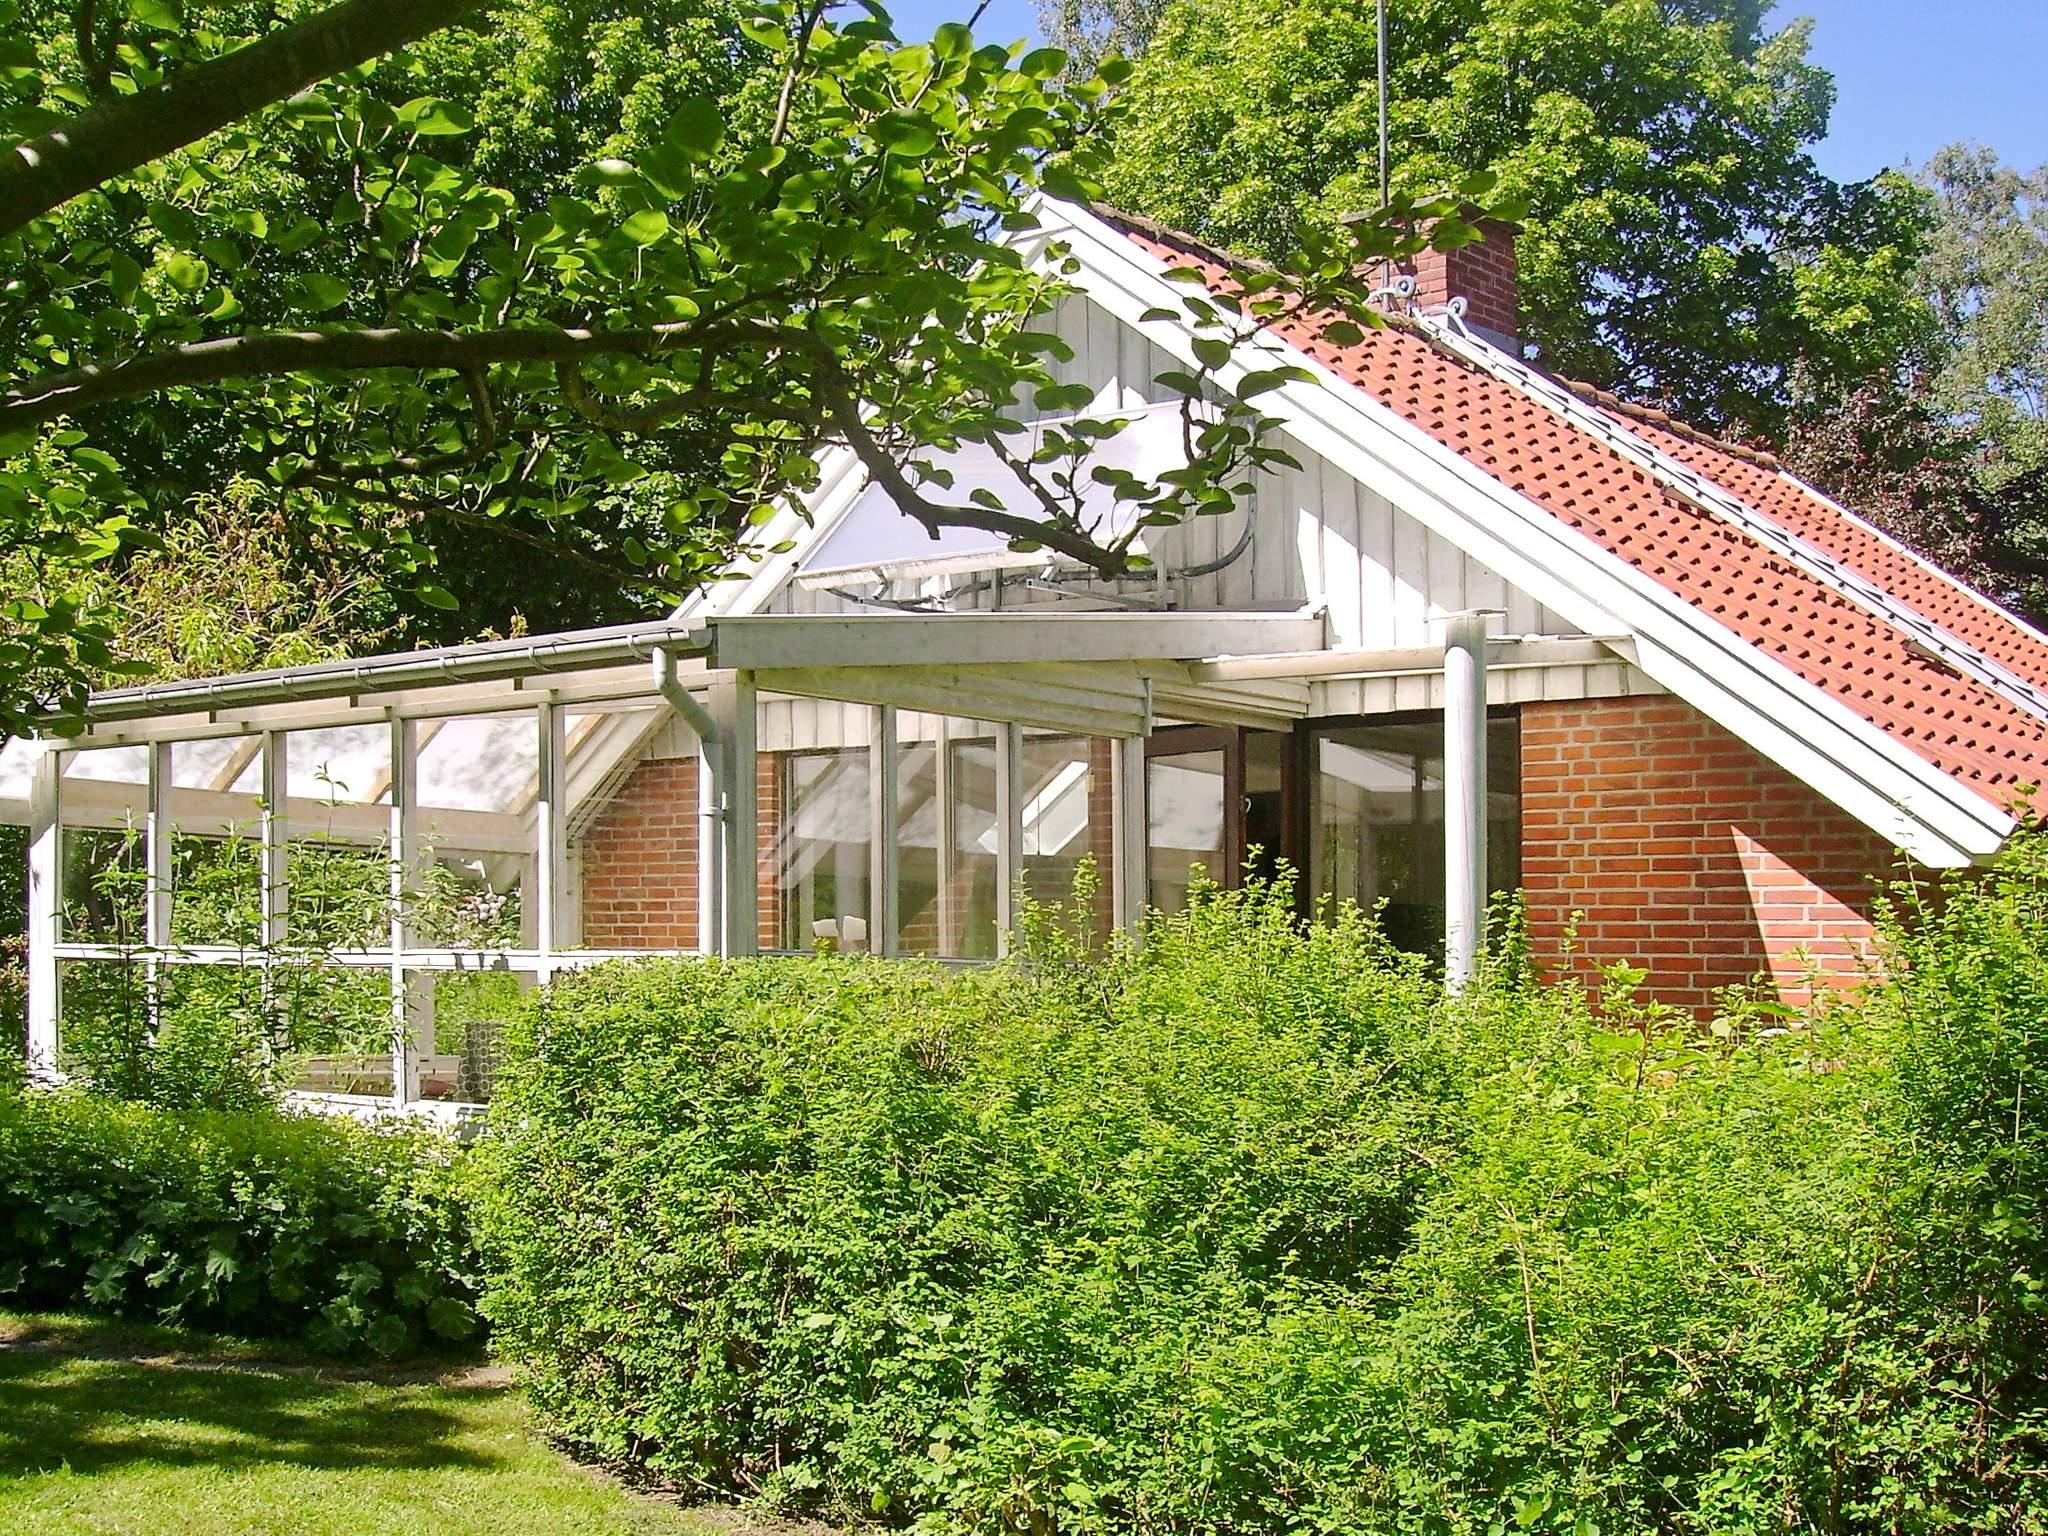 Ferienhaus Smidstrup Strand (135755), Smidstrup, , Nordseeland, Dänemark, Bild 4